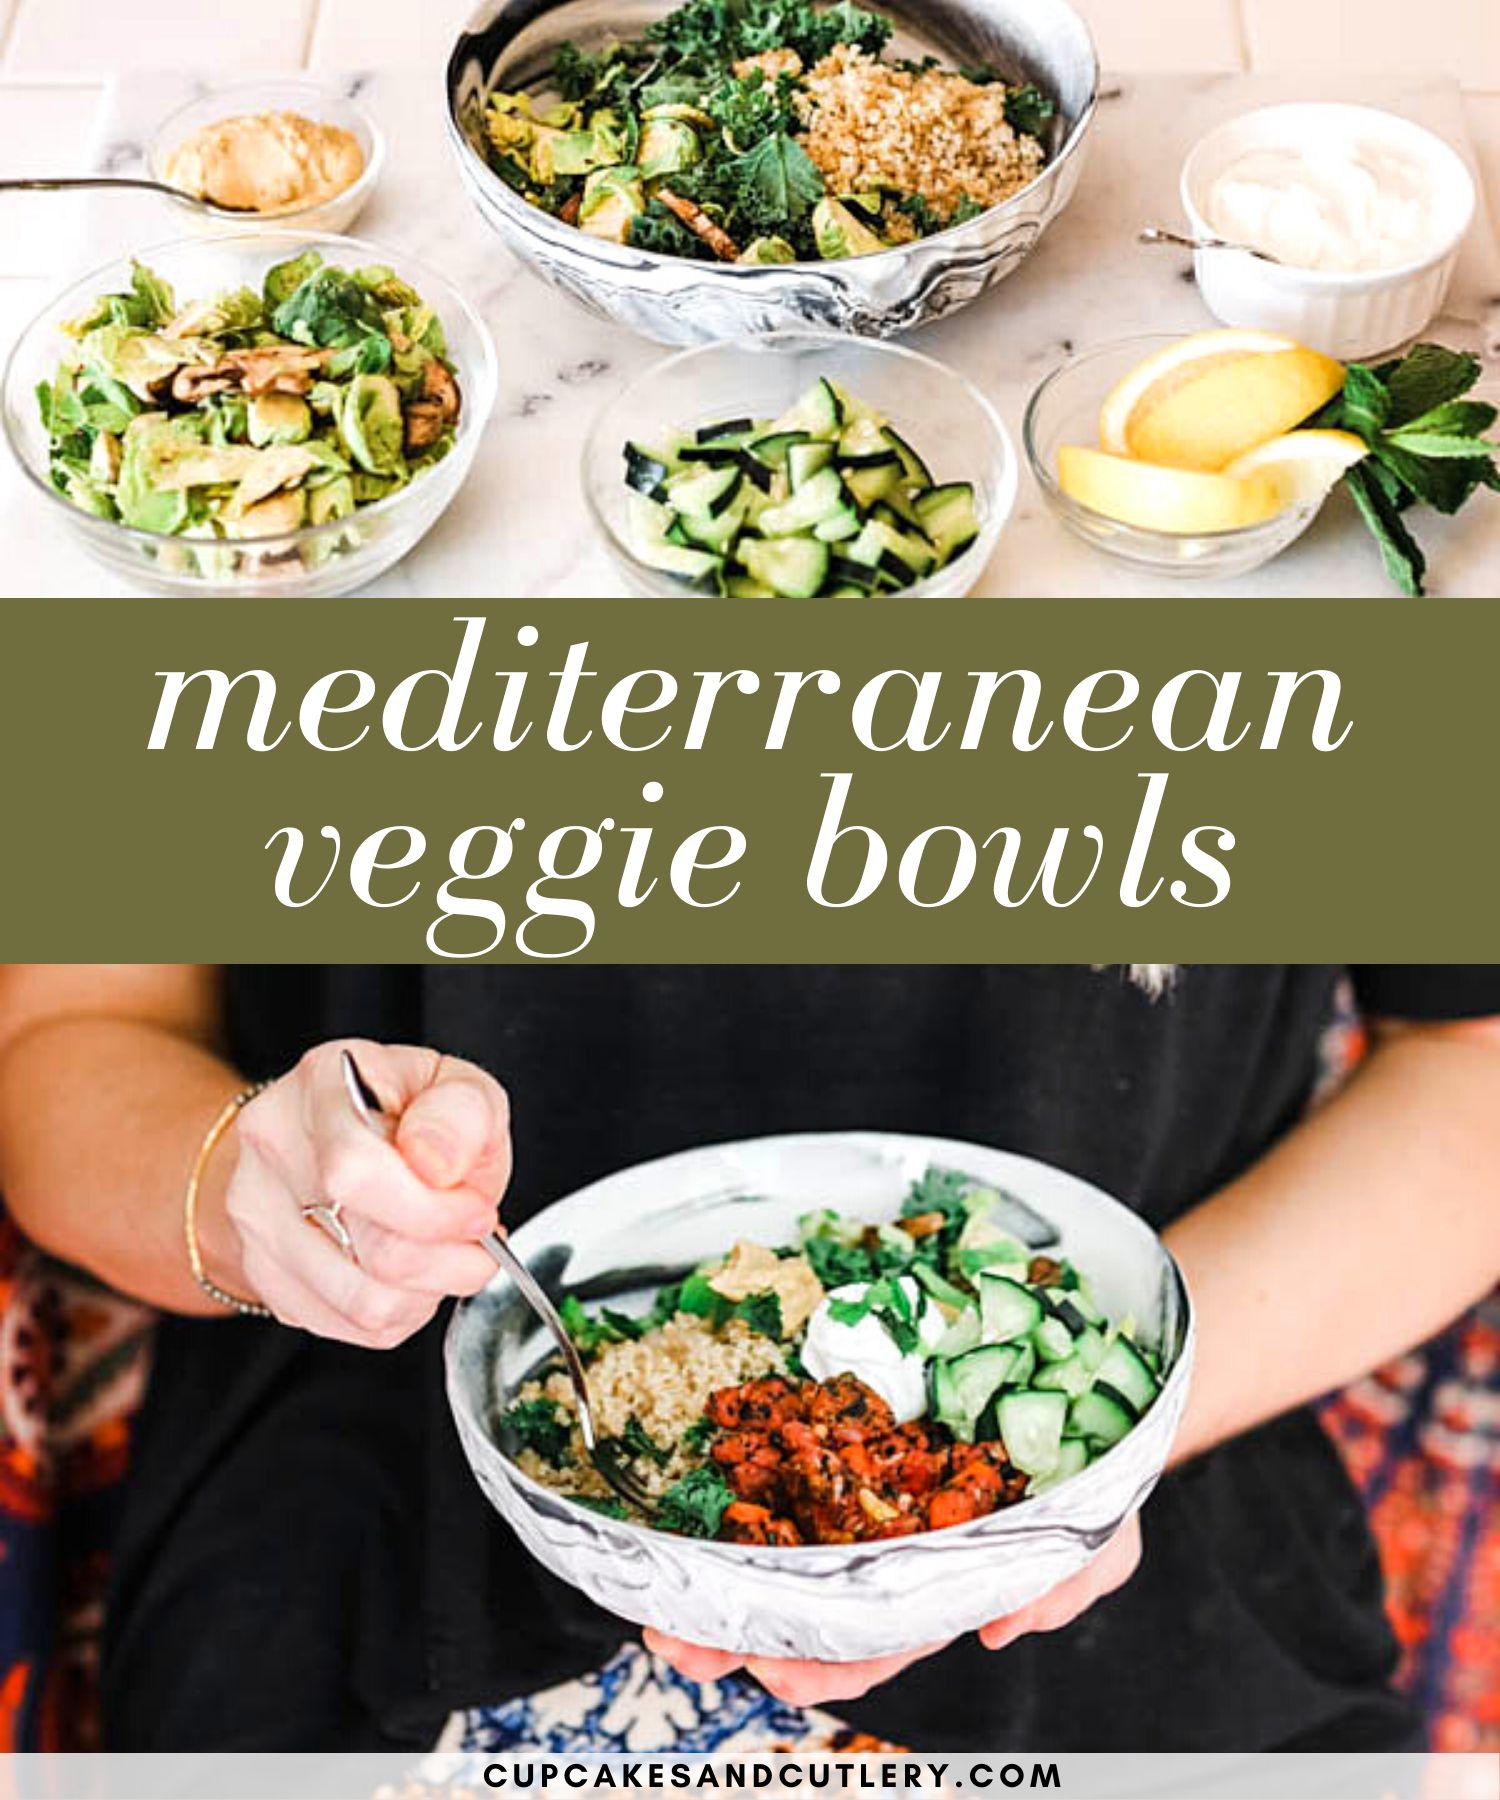 Easy Mediterranean Bowls With Bubba Veggie Burger Recipe In 2020 Vegan Recipes Easy Veggie Bowl Clean Eating Recipes